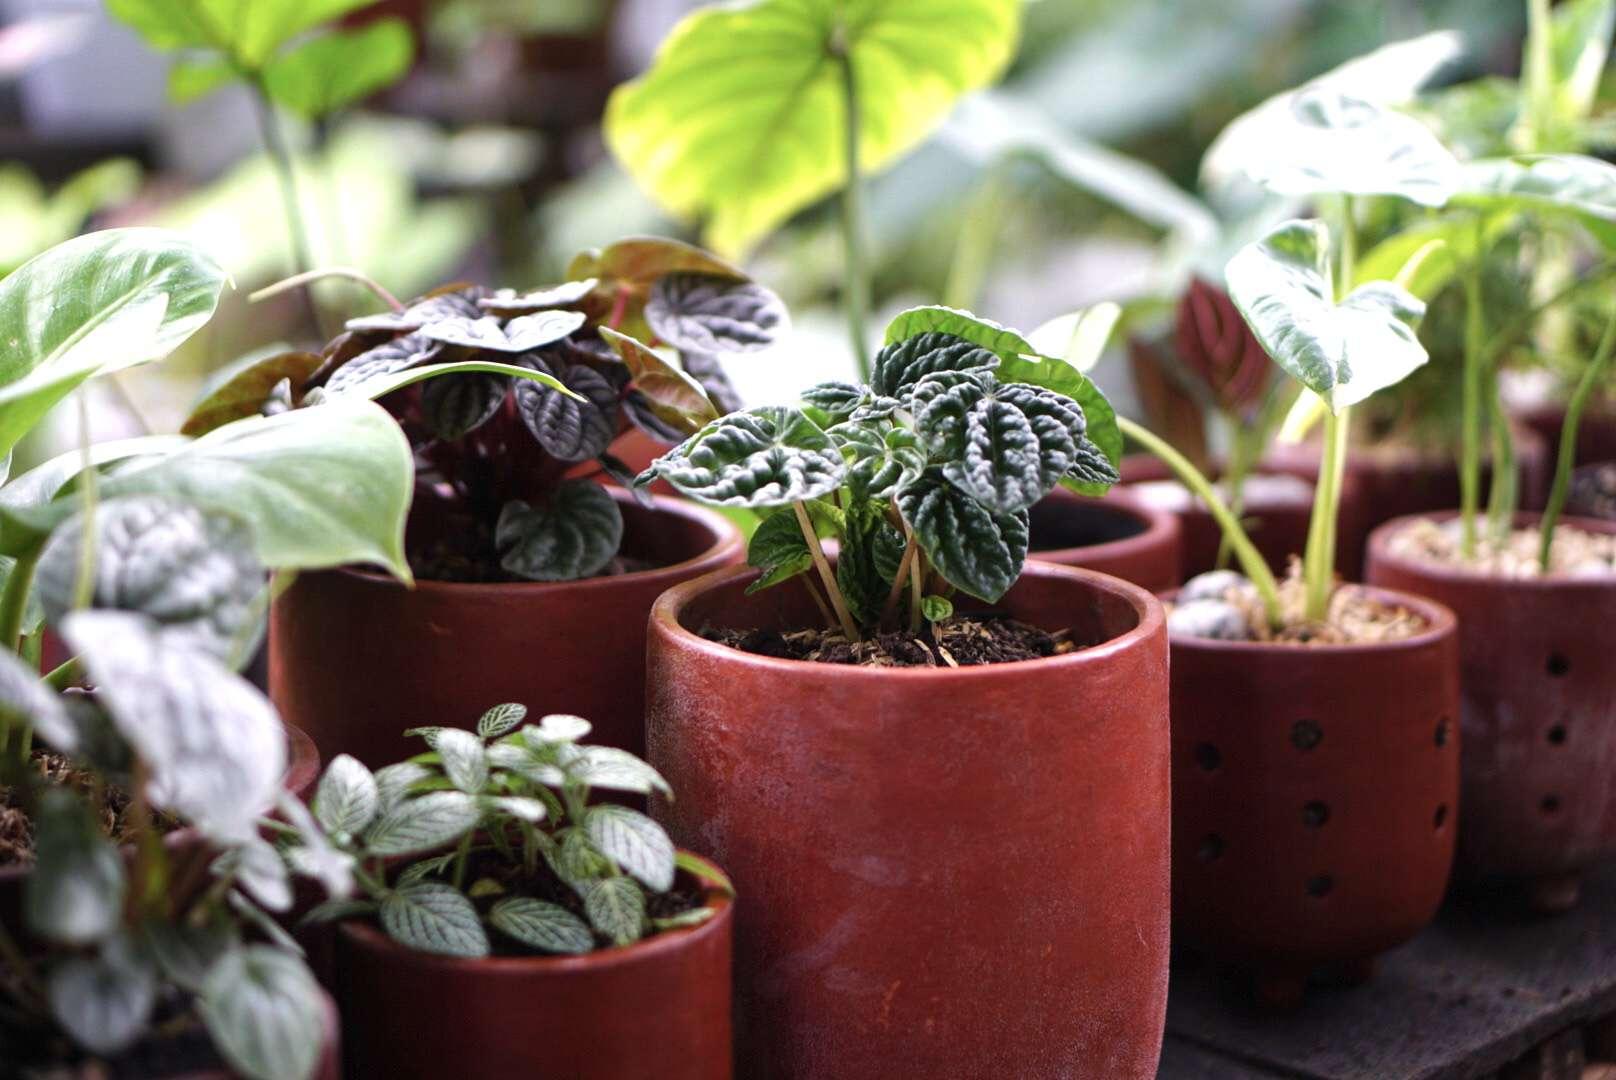 light shining on plants